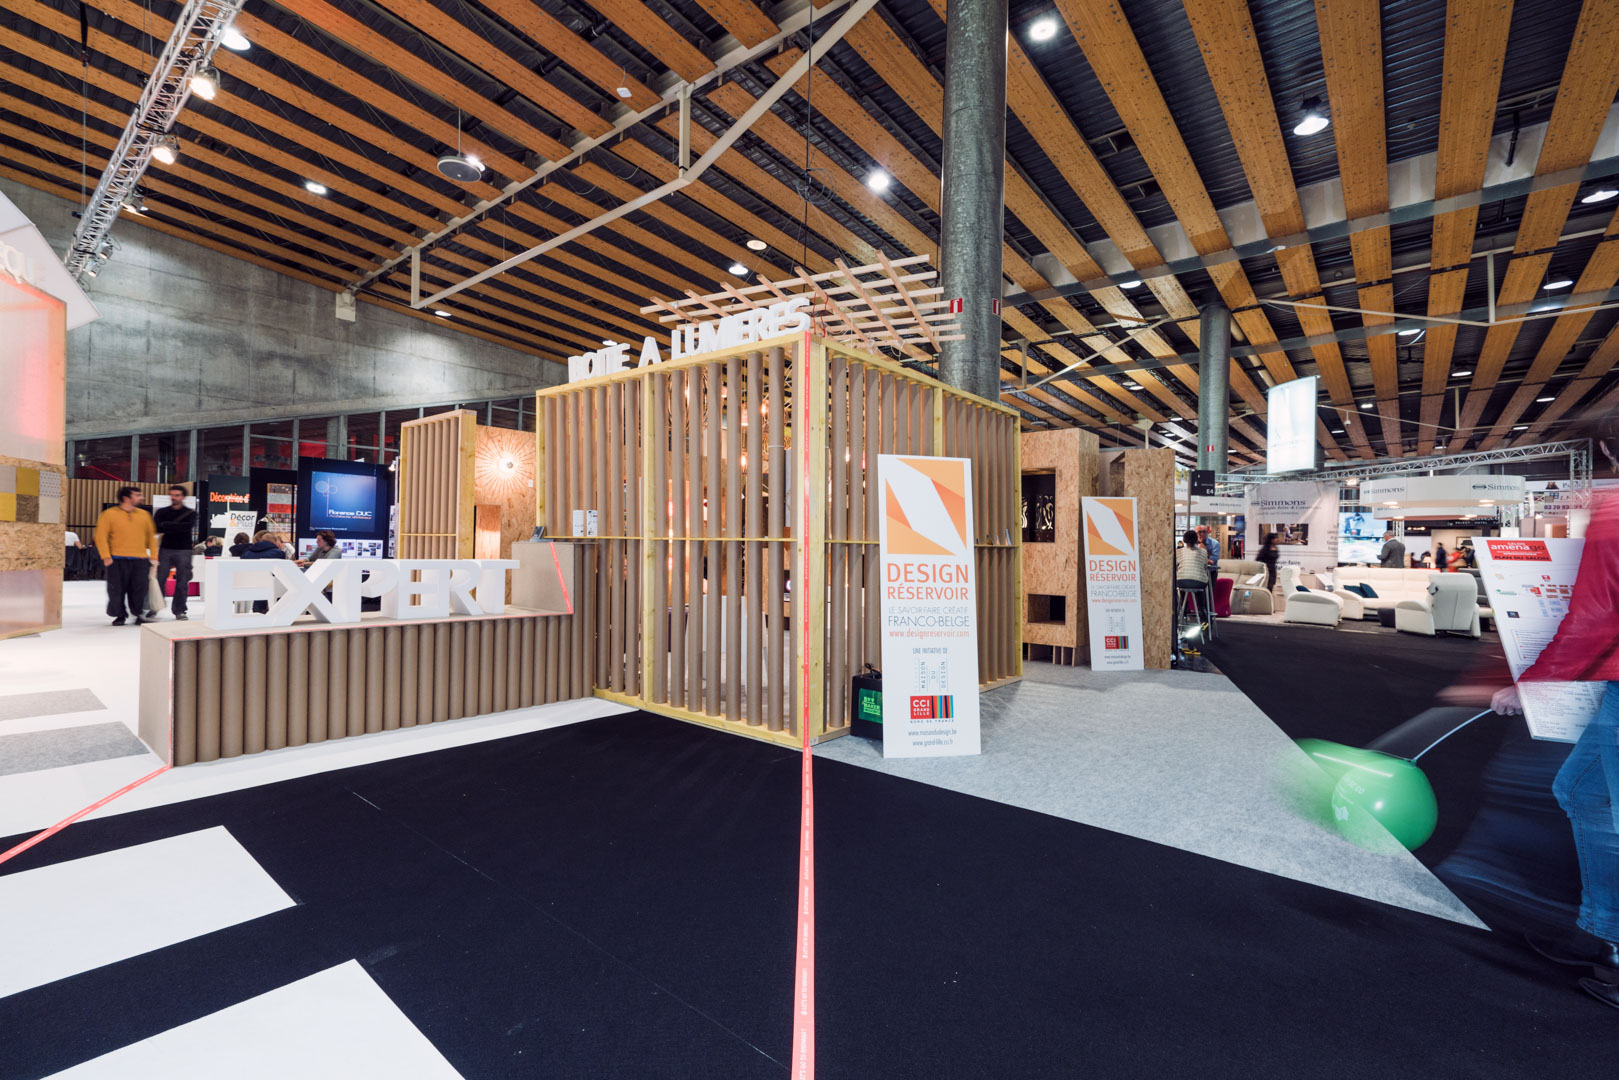 Salon amenago 2015 architecte lille plux - Salon a lille grand palais ...